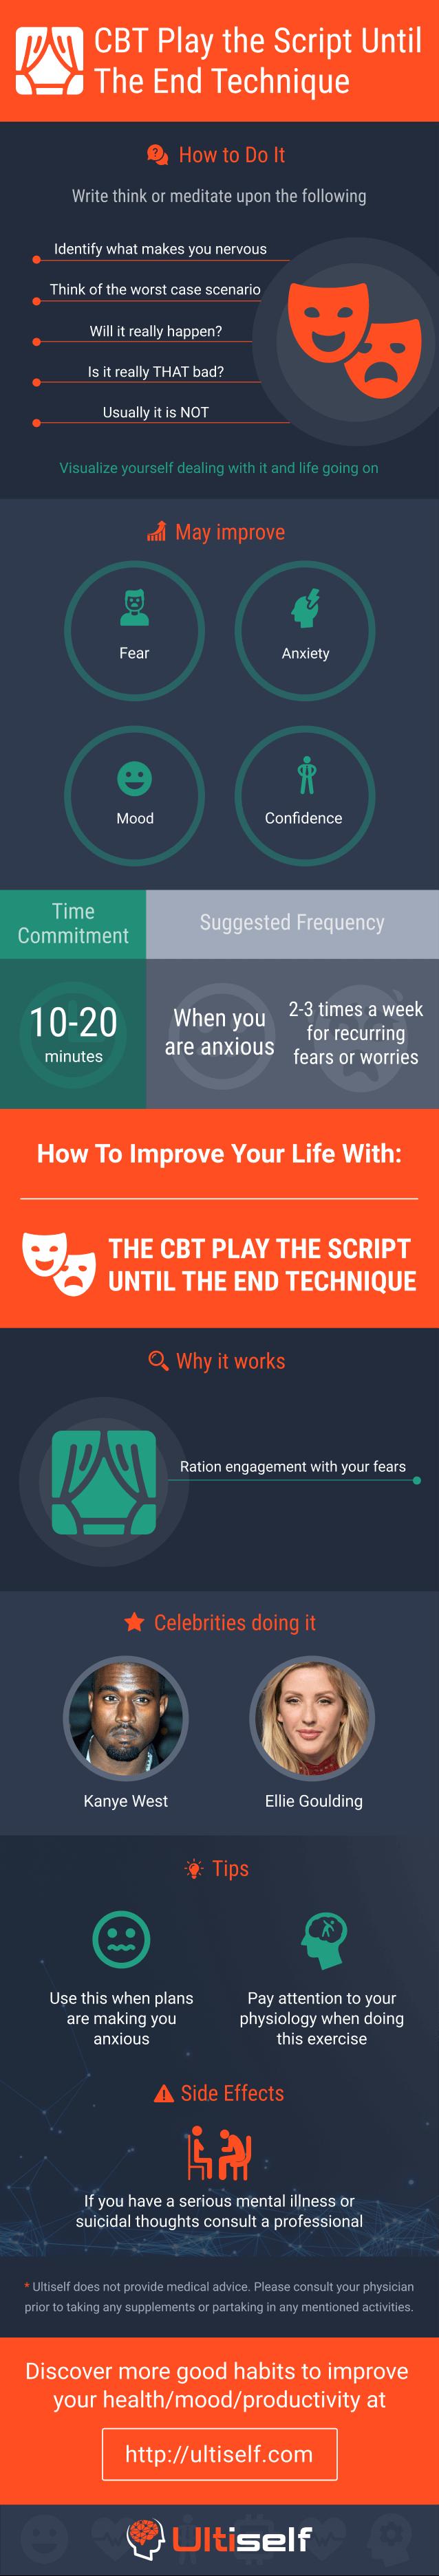 CBT Play the Script Until The end Technique infographic